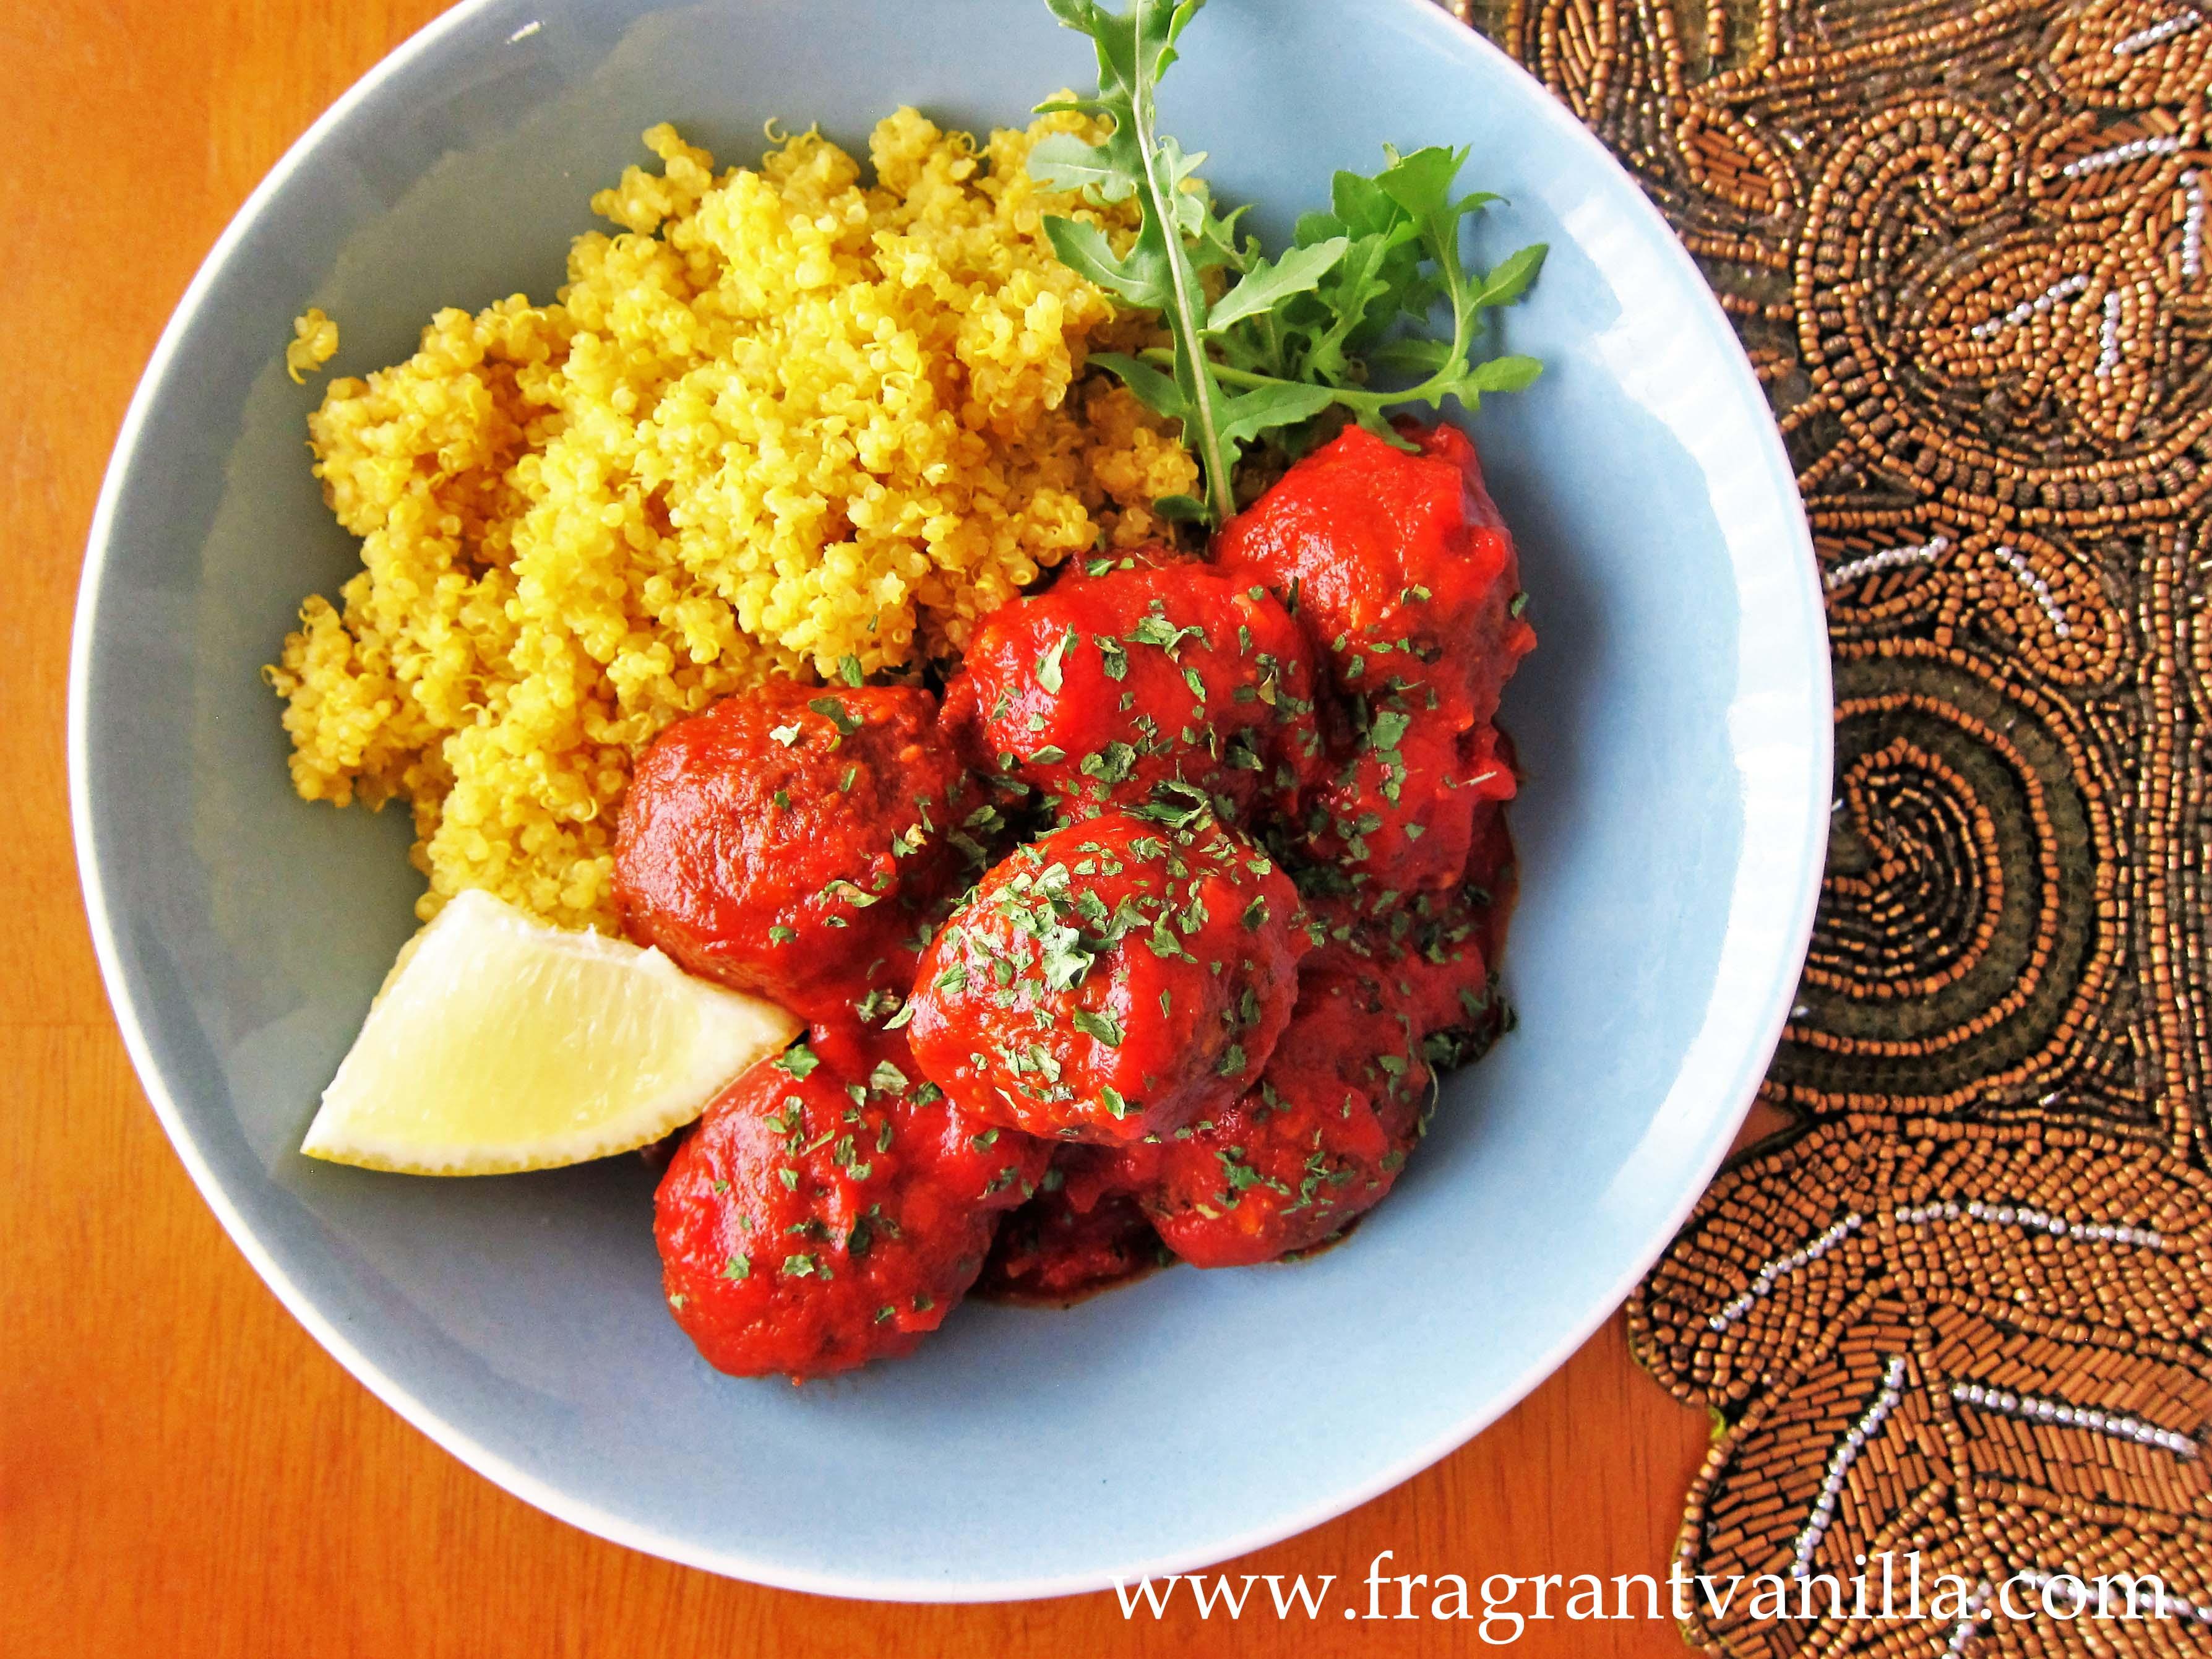 Vegan Moroccan Lentil Meatballs